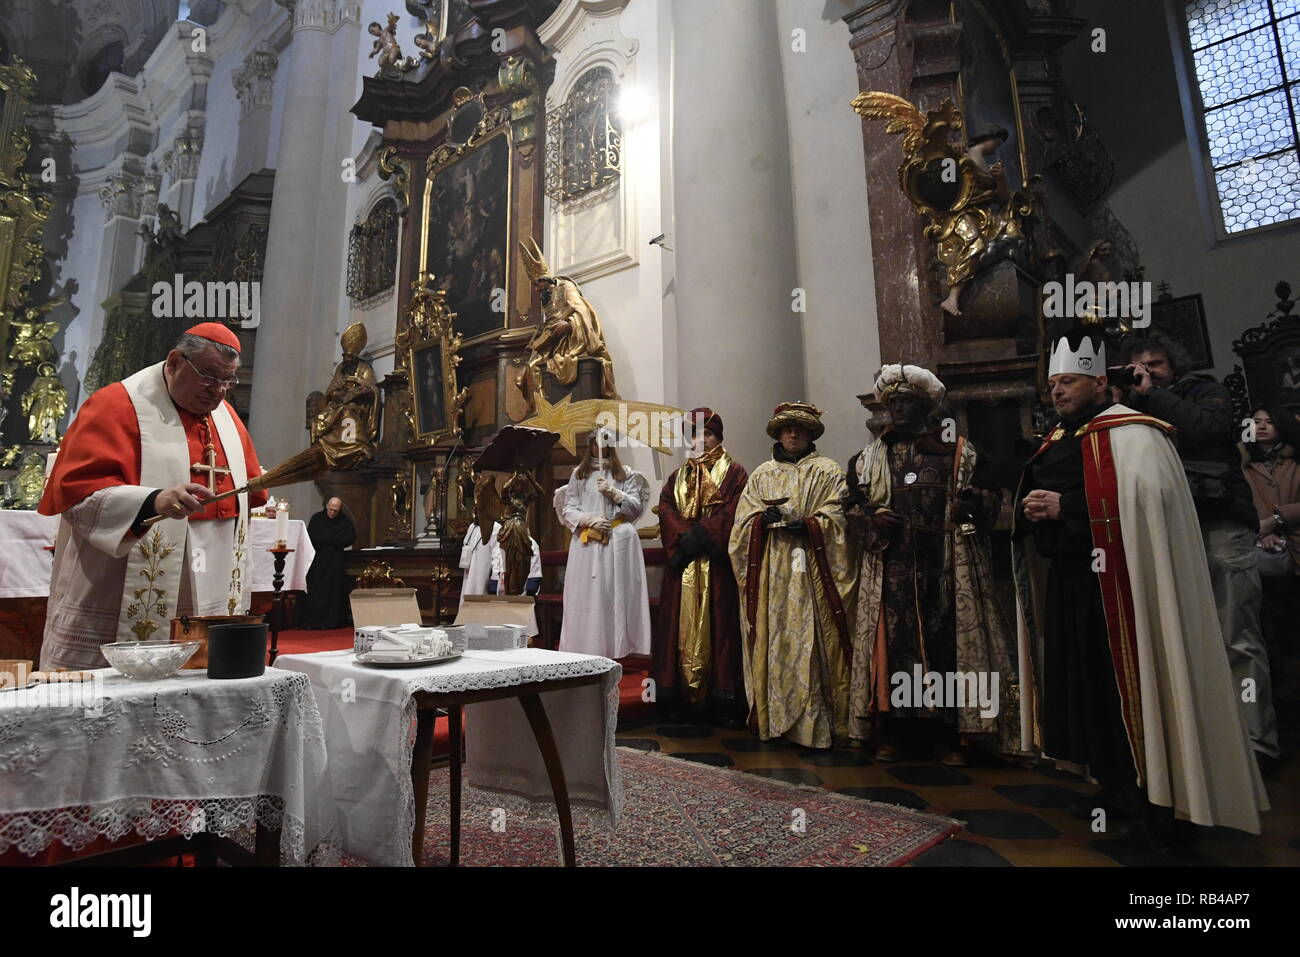 Prague, Czech Republic. 06th Jan, 2019. Cardinal Dominik Duka blesses the charity-organized Three Kings' Money Collection in Prague, Czech Republic, January 6, 2019. Credit: Michal Krumphanzl/CTK Photo/Alamy Live News - Stock Image